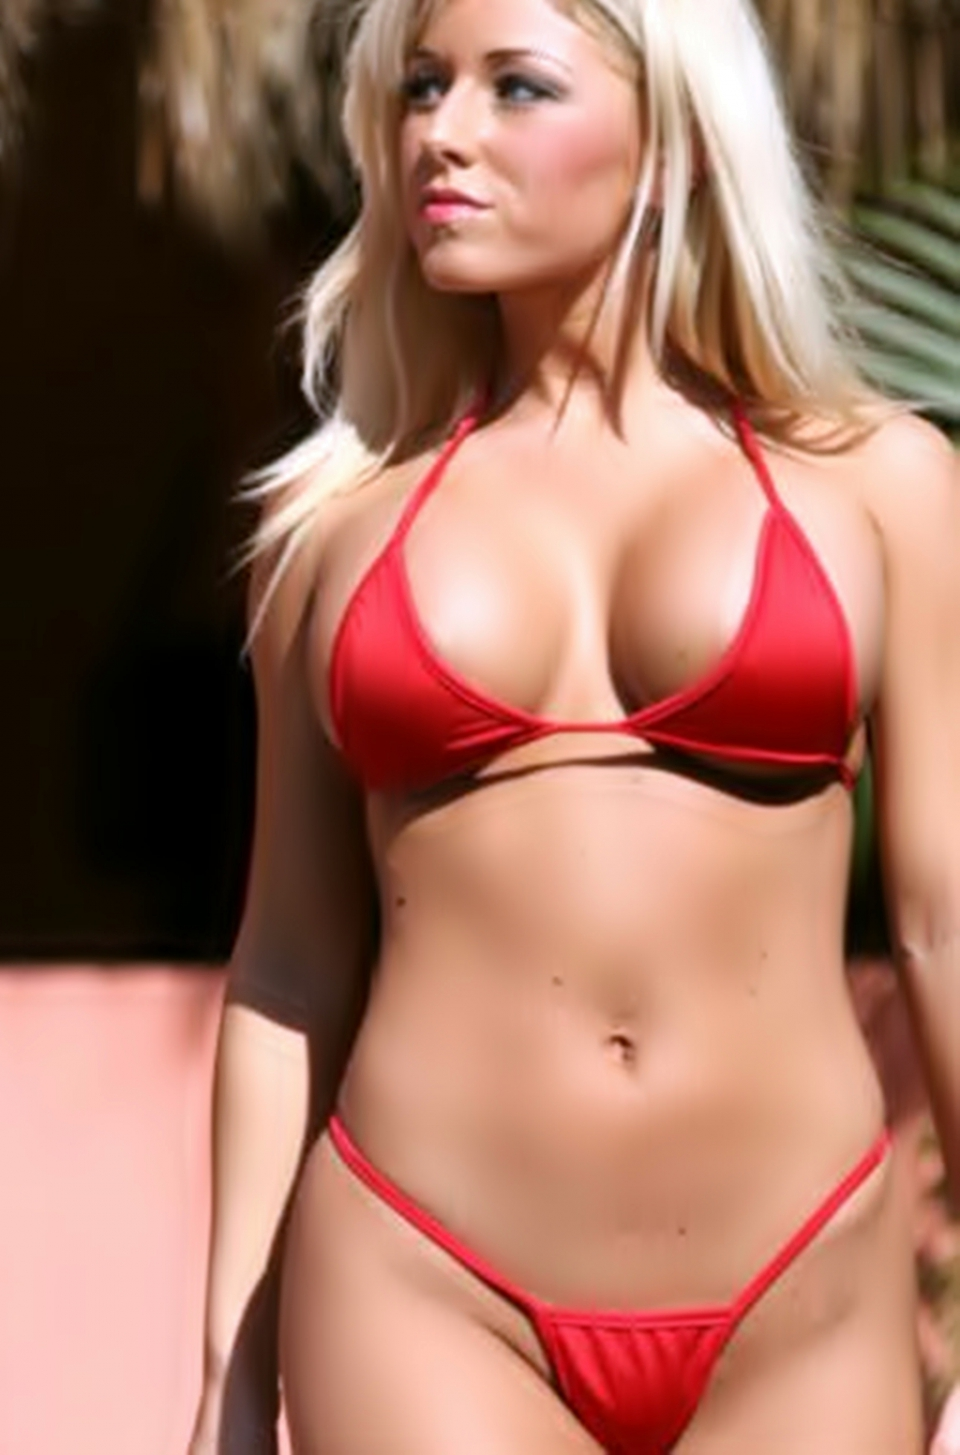 Wicked weasel bikini see through - Justimg.com